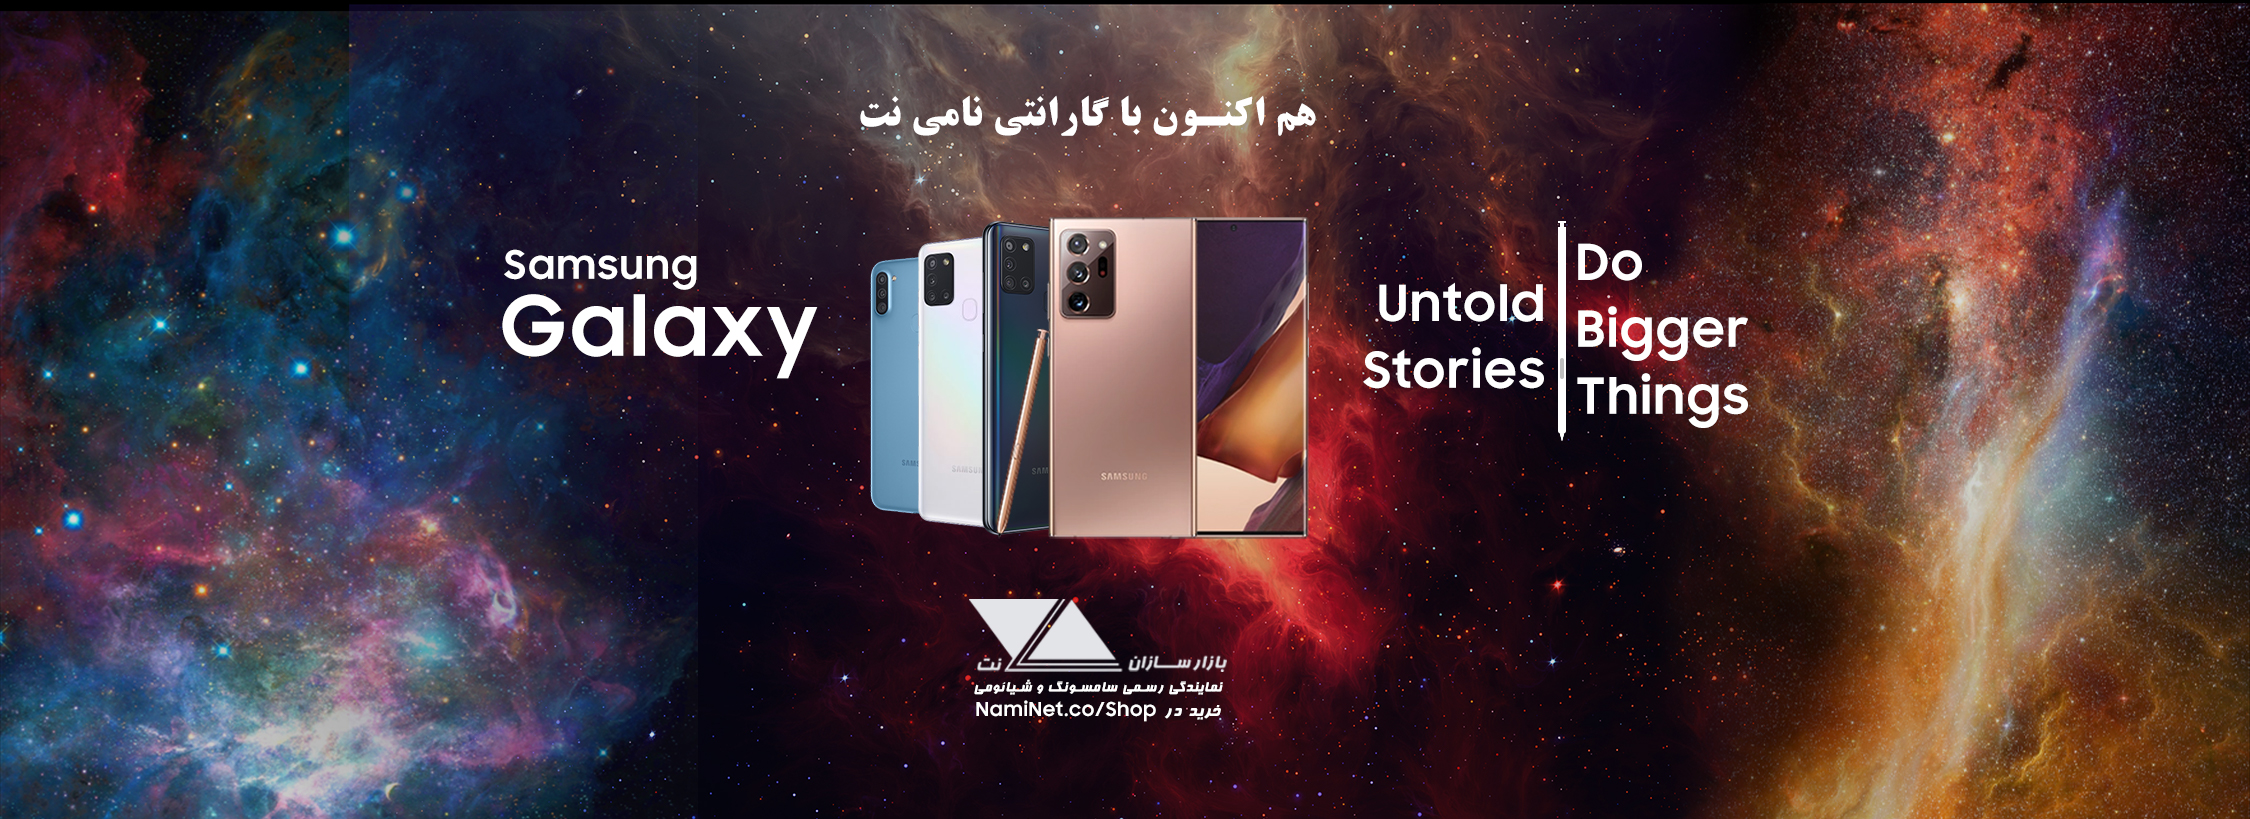 Samsung Galaxy Products